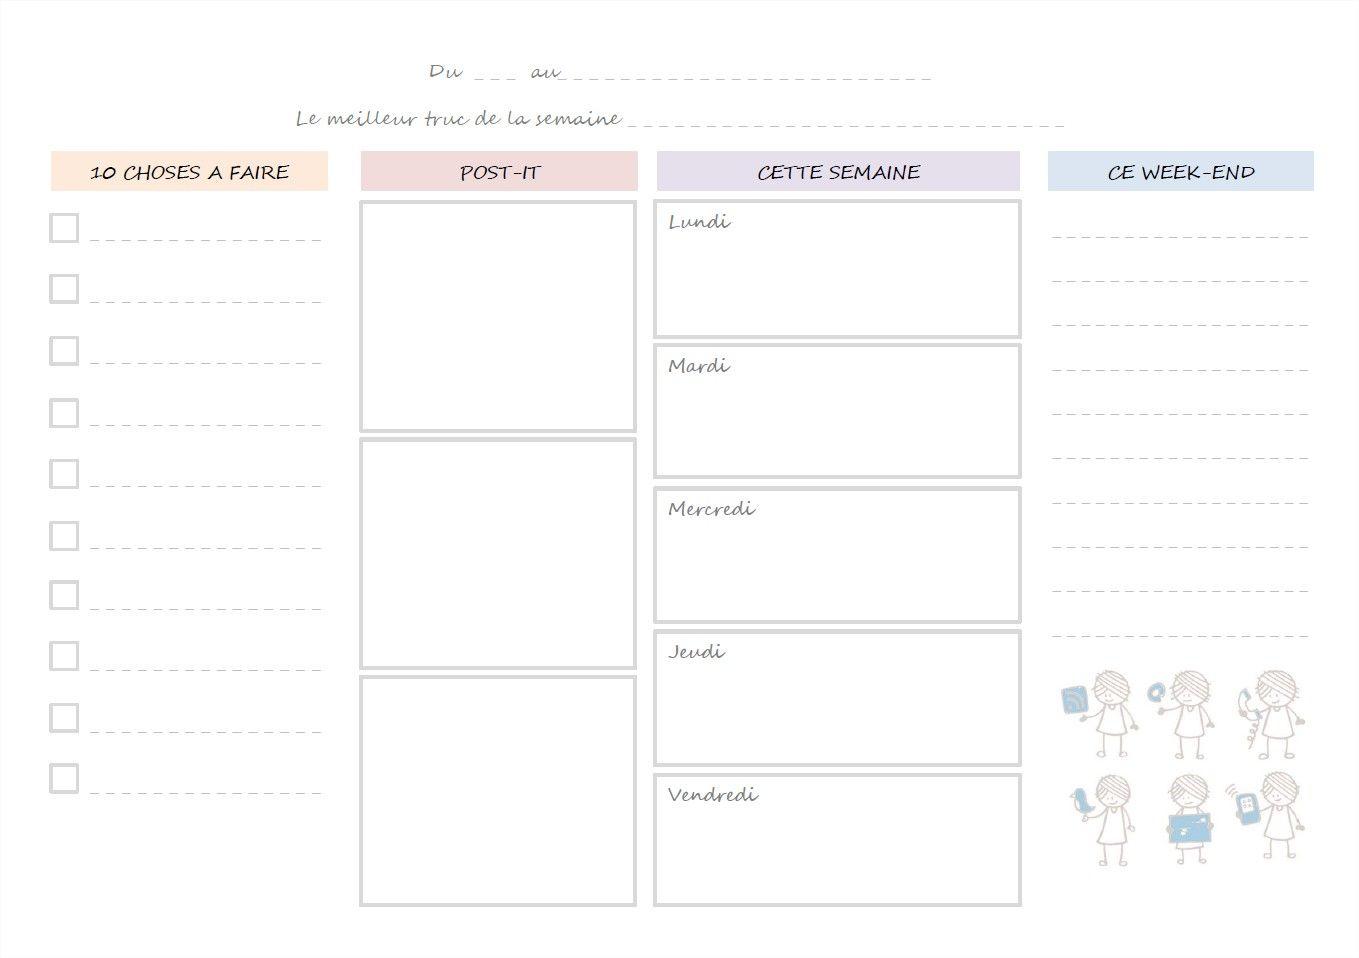 week planning agenda de la semaine calendrier agenda pinterest planning agenda et. Black Bedroom Furniture Sets. Home Design Ideas